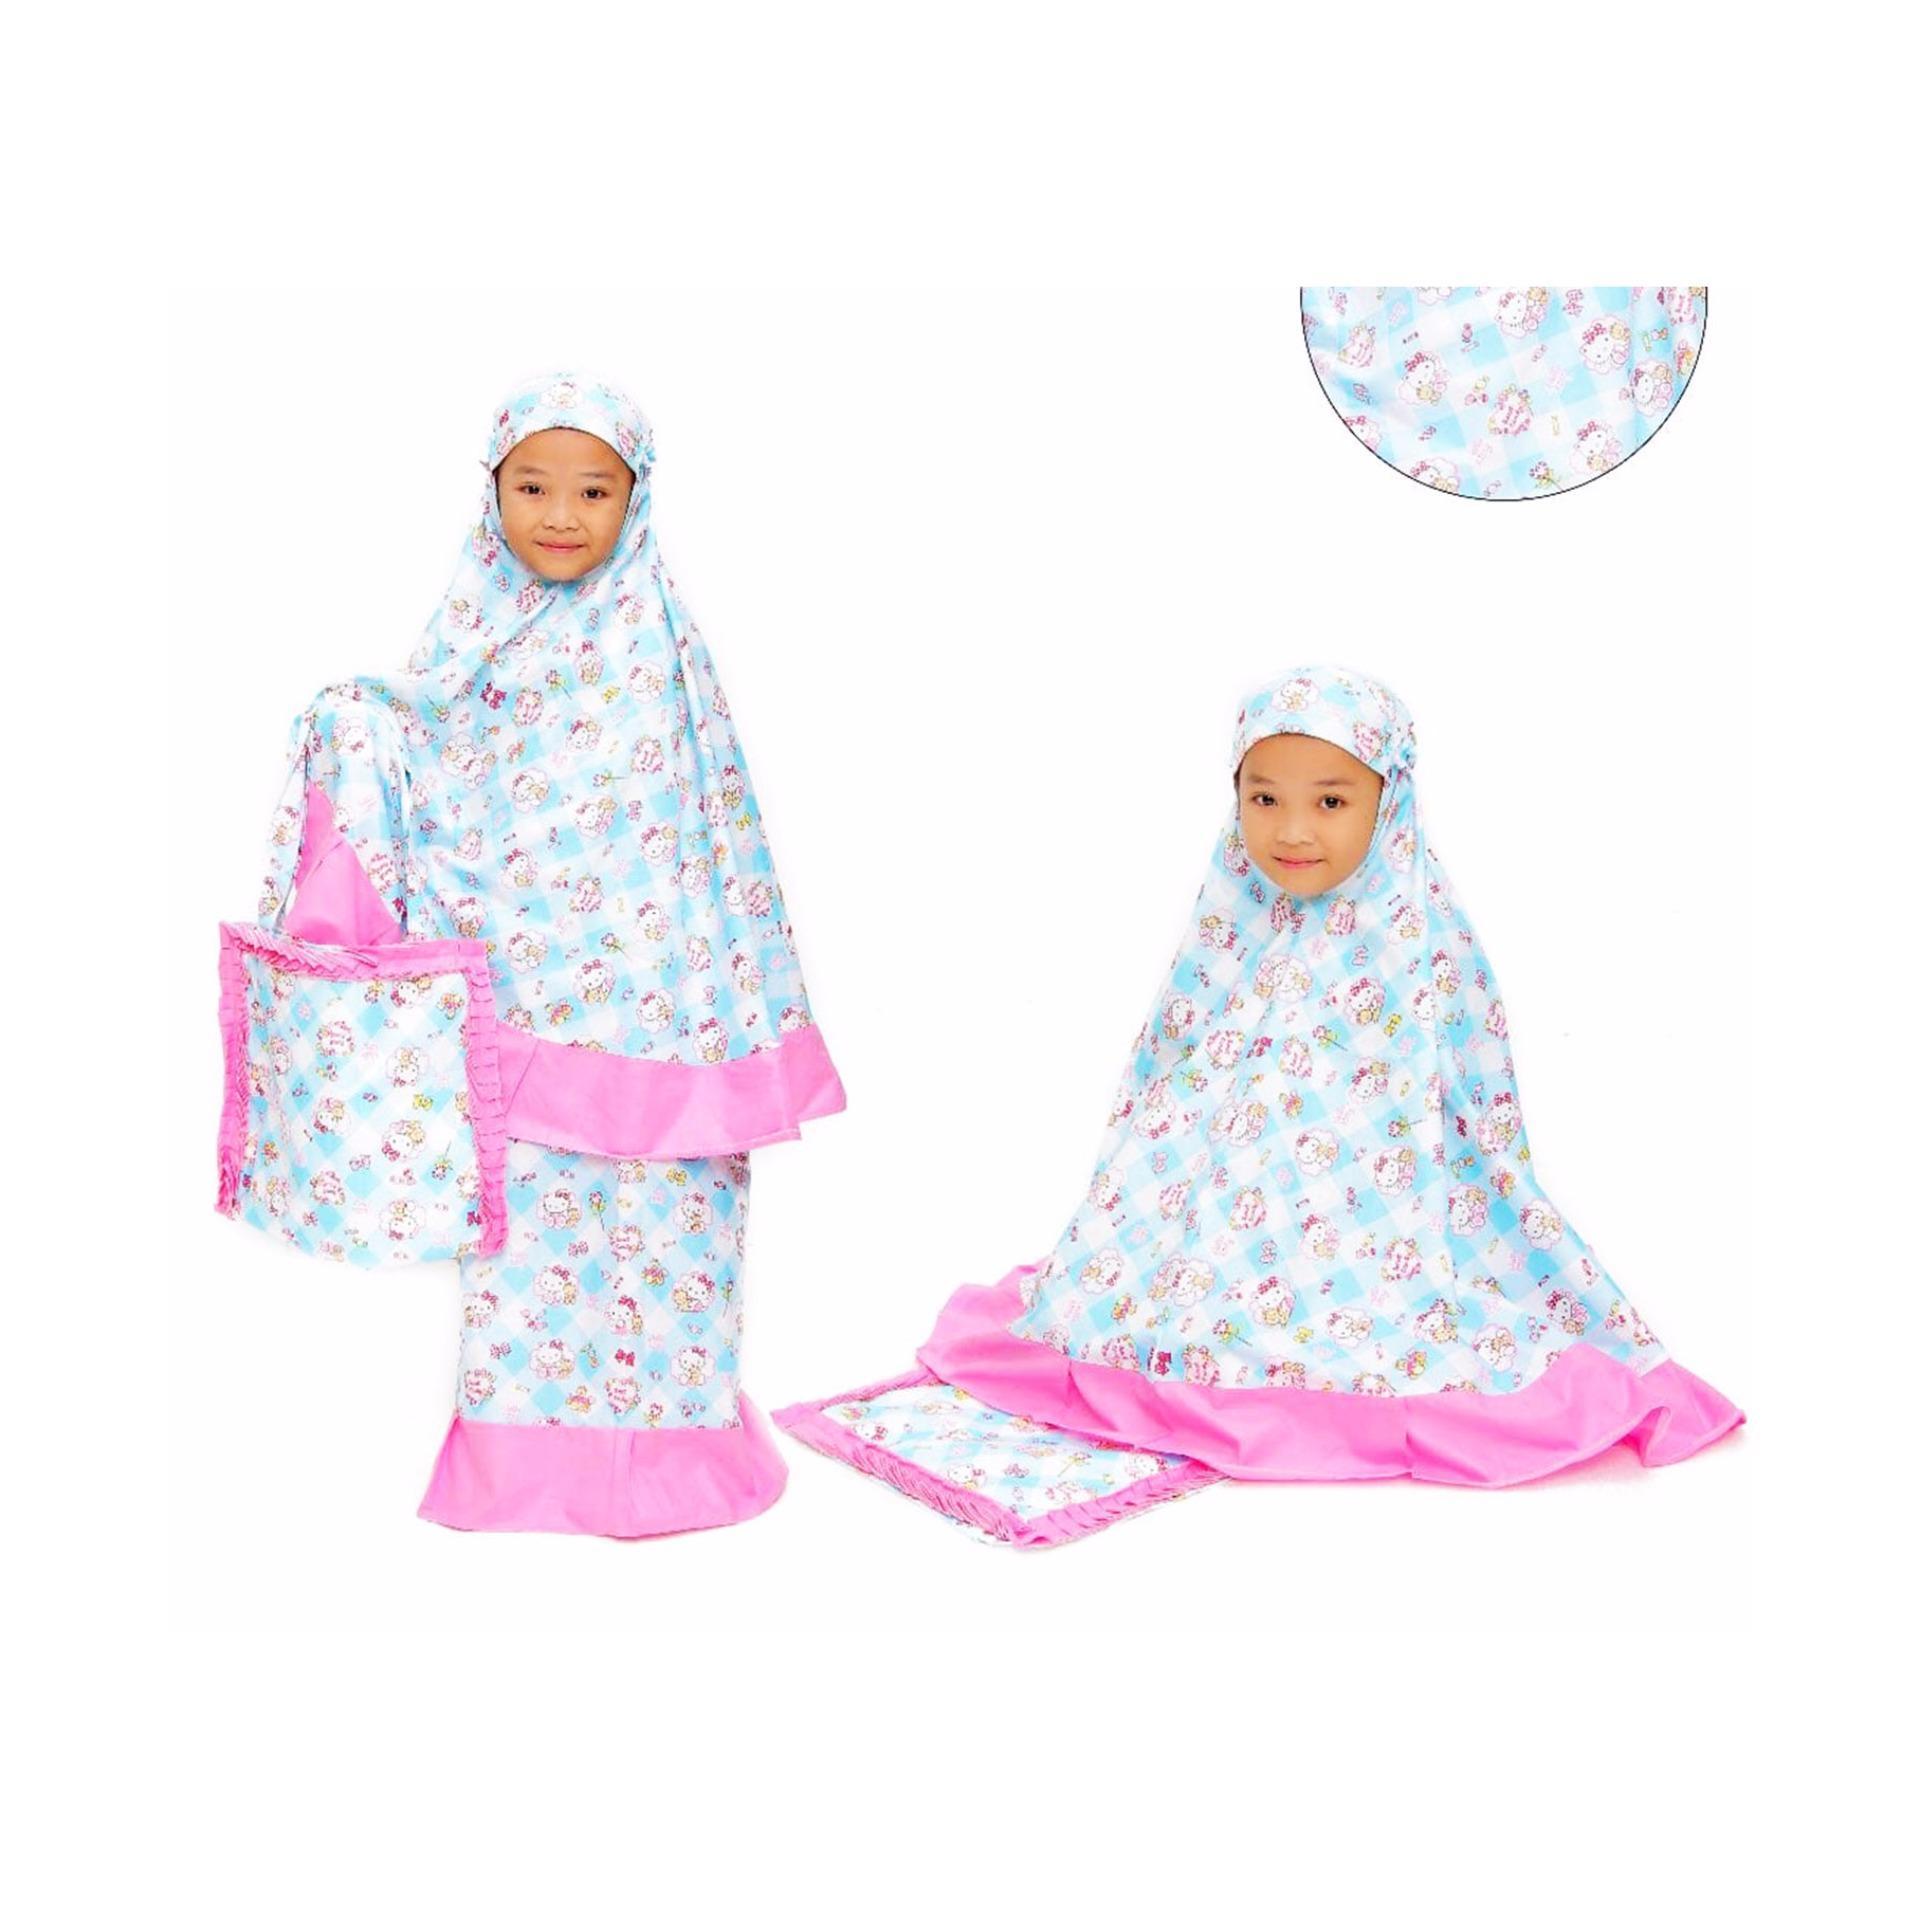 Harga preferensial Mukena HK Candy Pastel Cantik Pink beli sekarang - Hanya Rp135.900